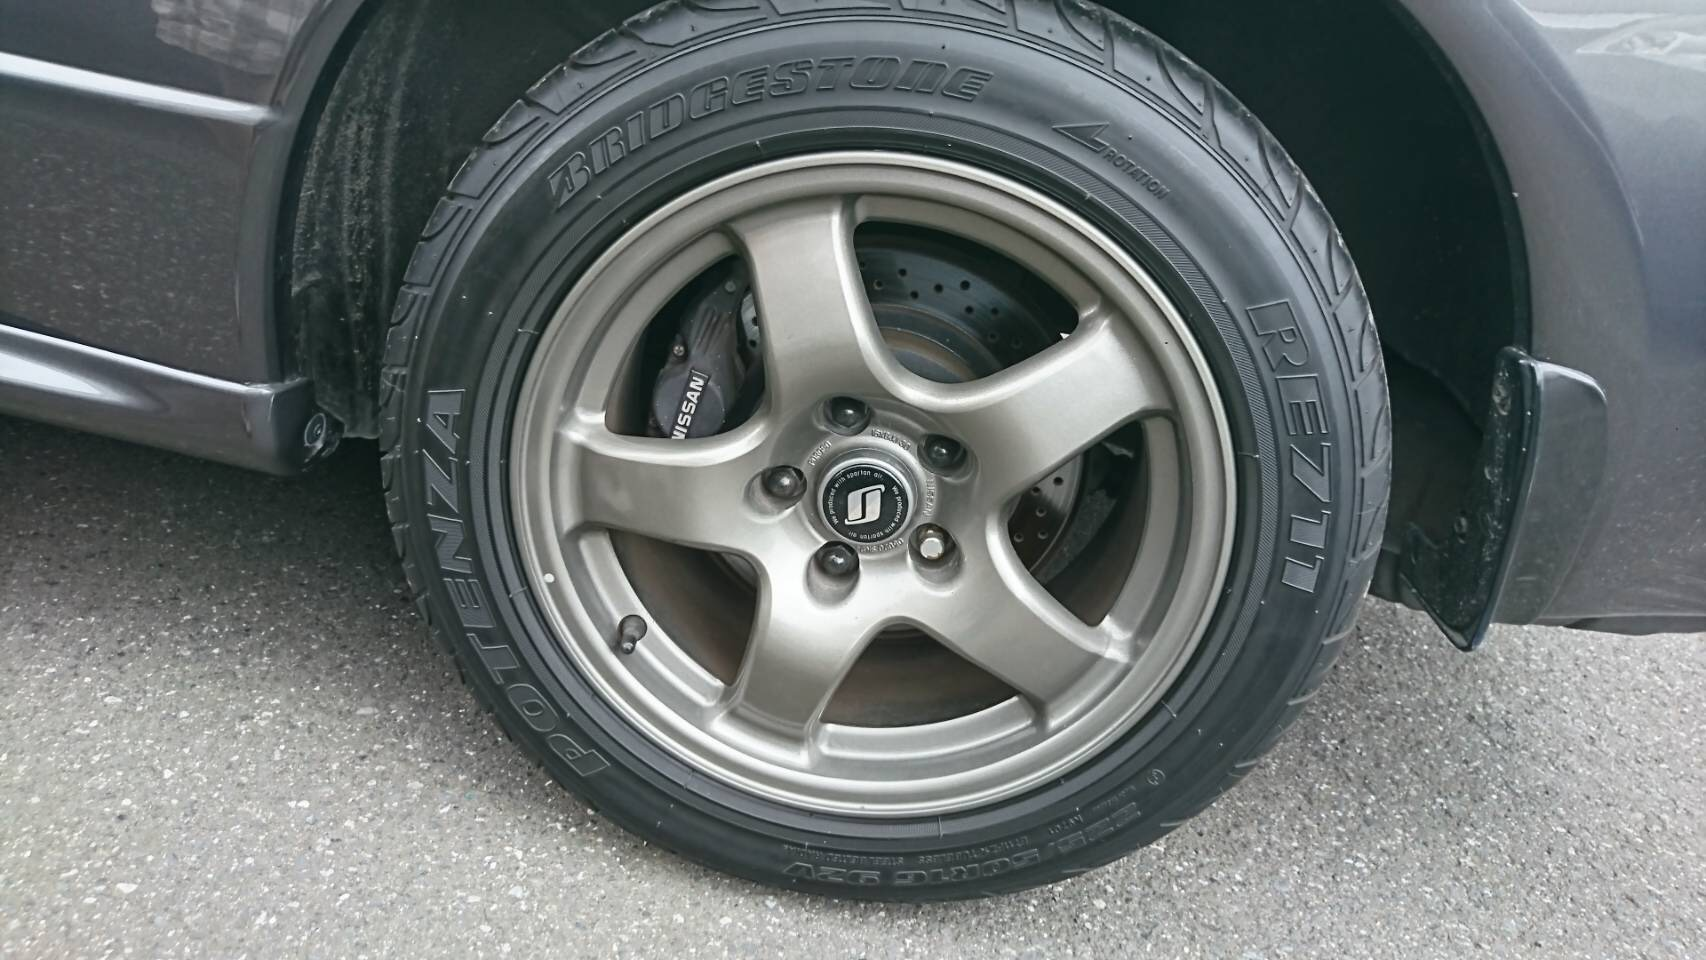 1992 Nissan Skyline R32 GTR wheel